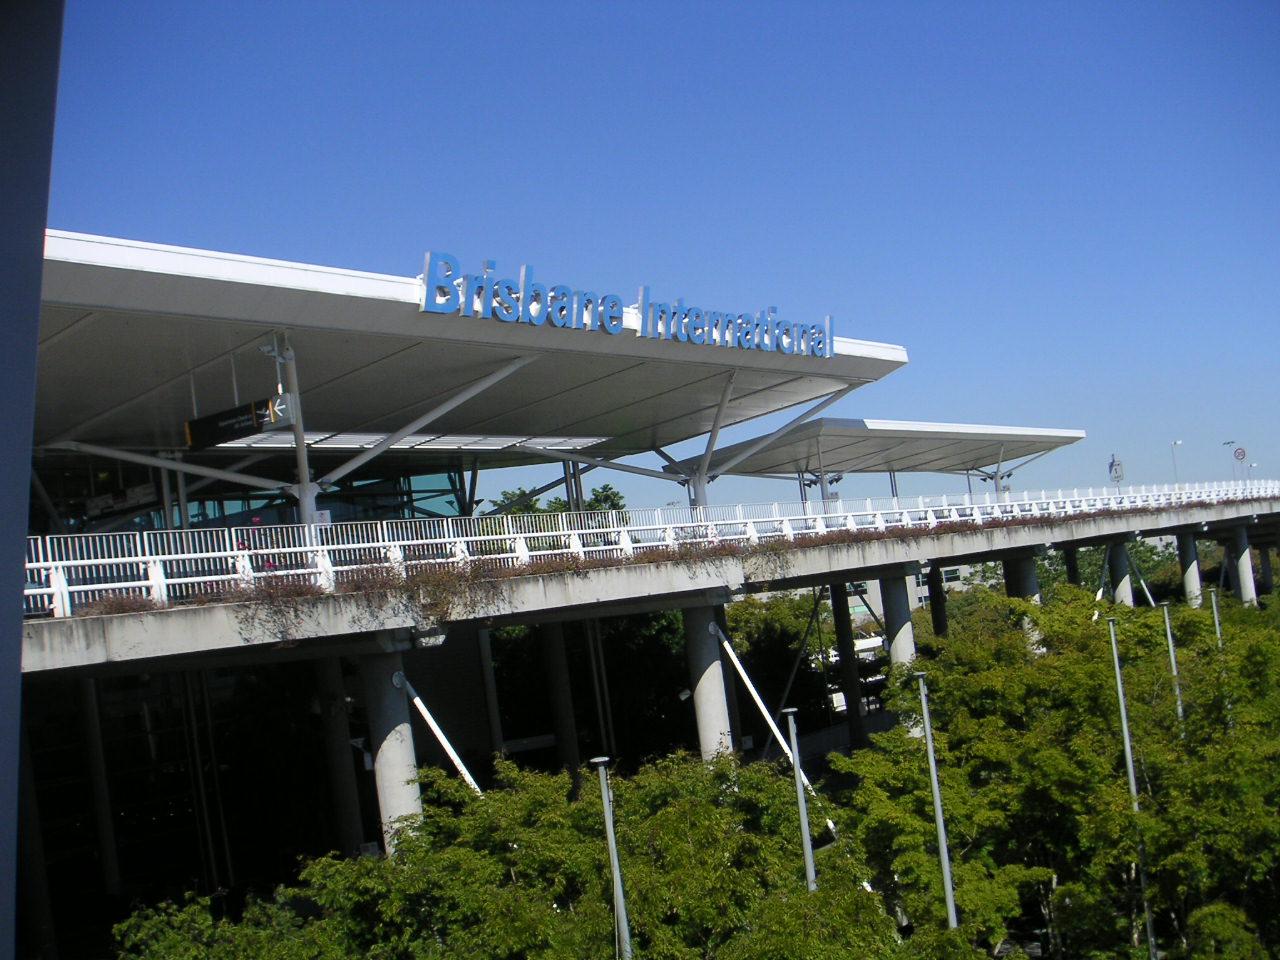 Depiction of Aeropuerto de Brisbane